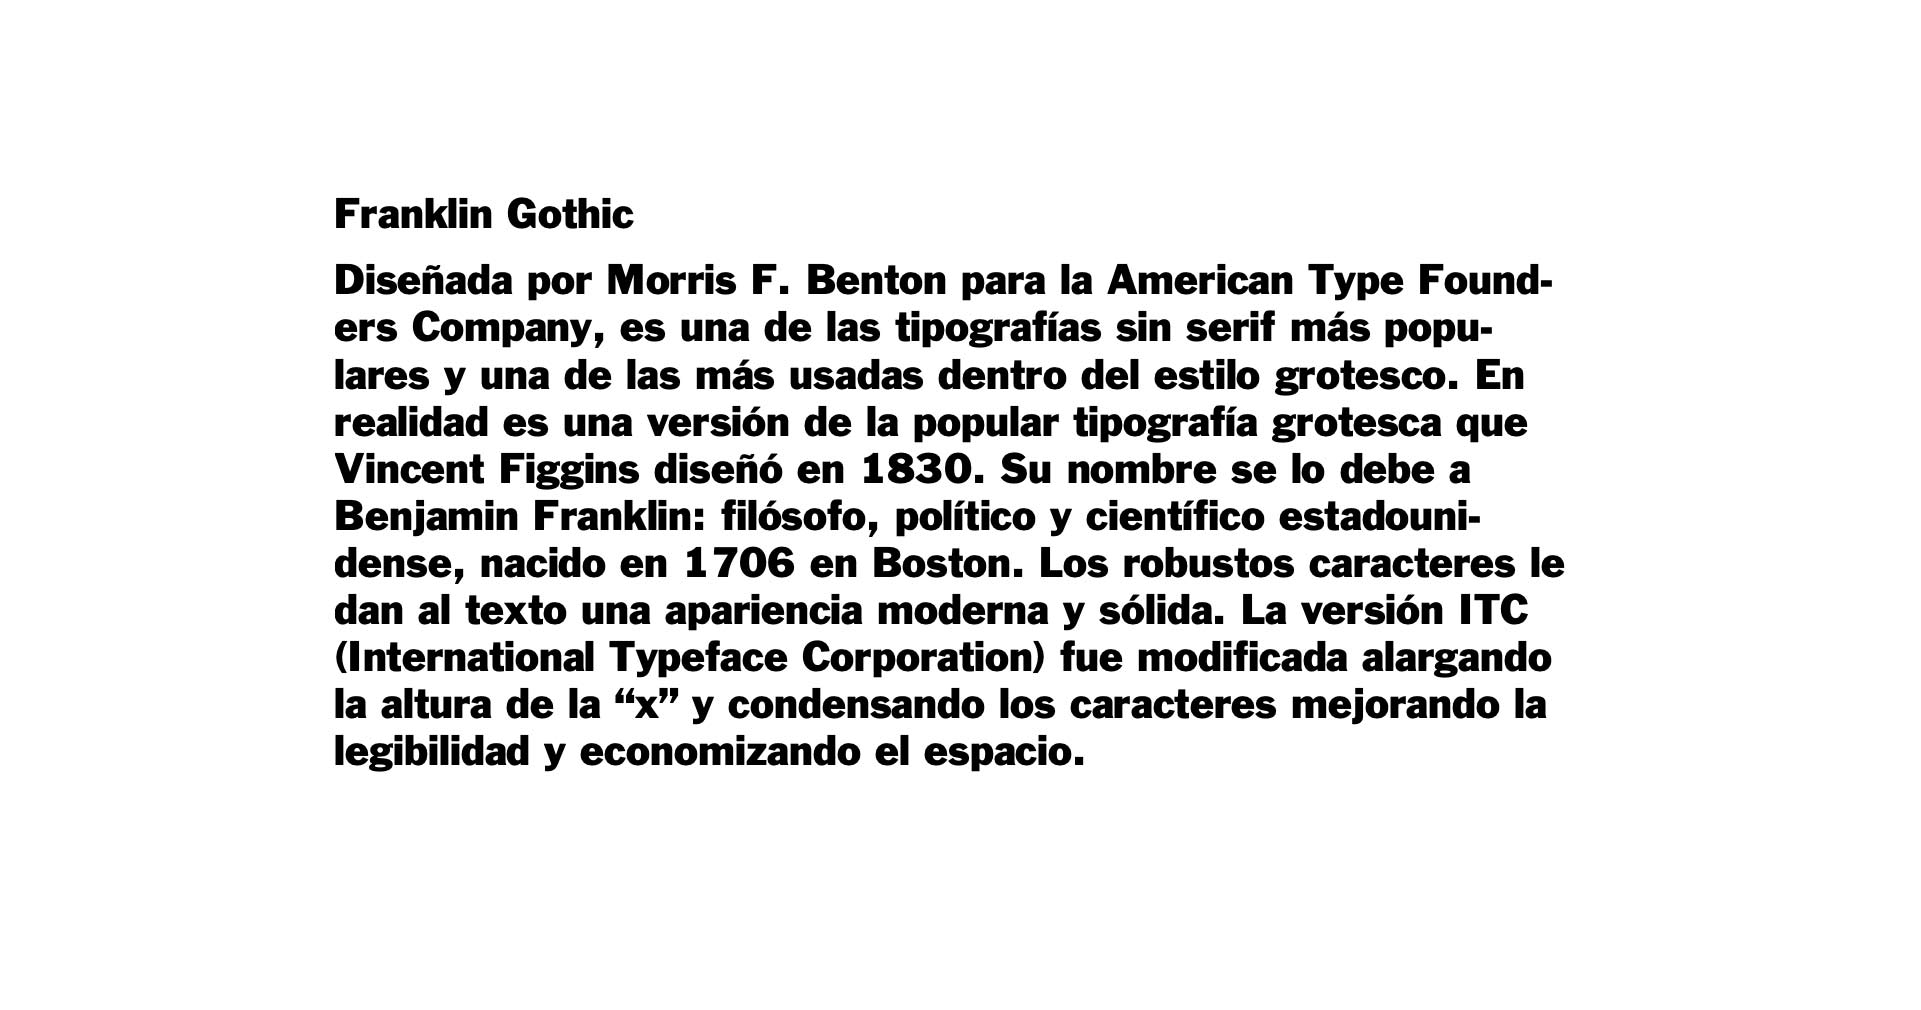 Franklin Gothic typography